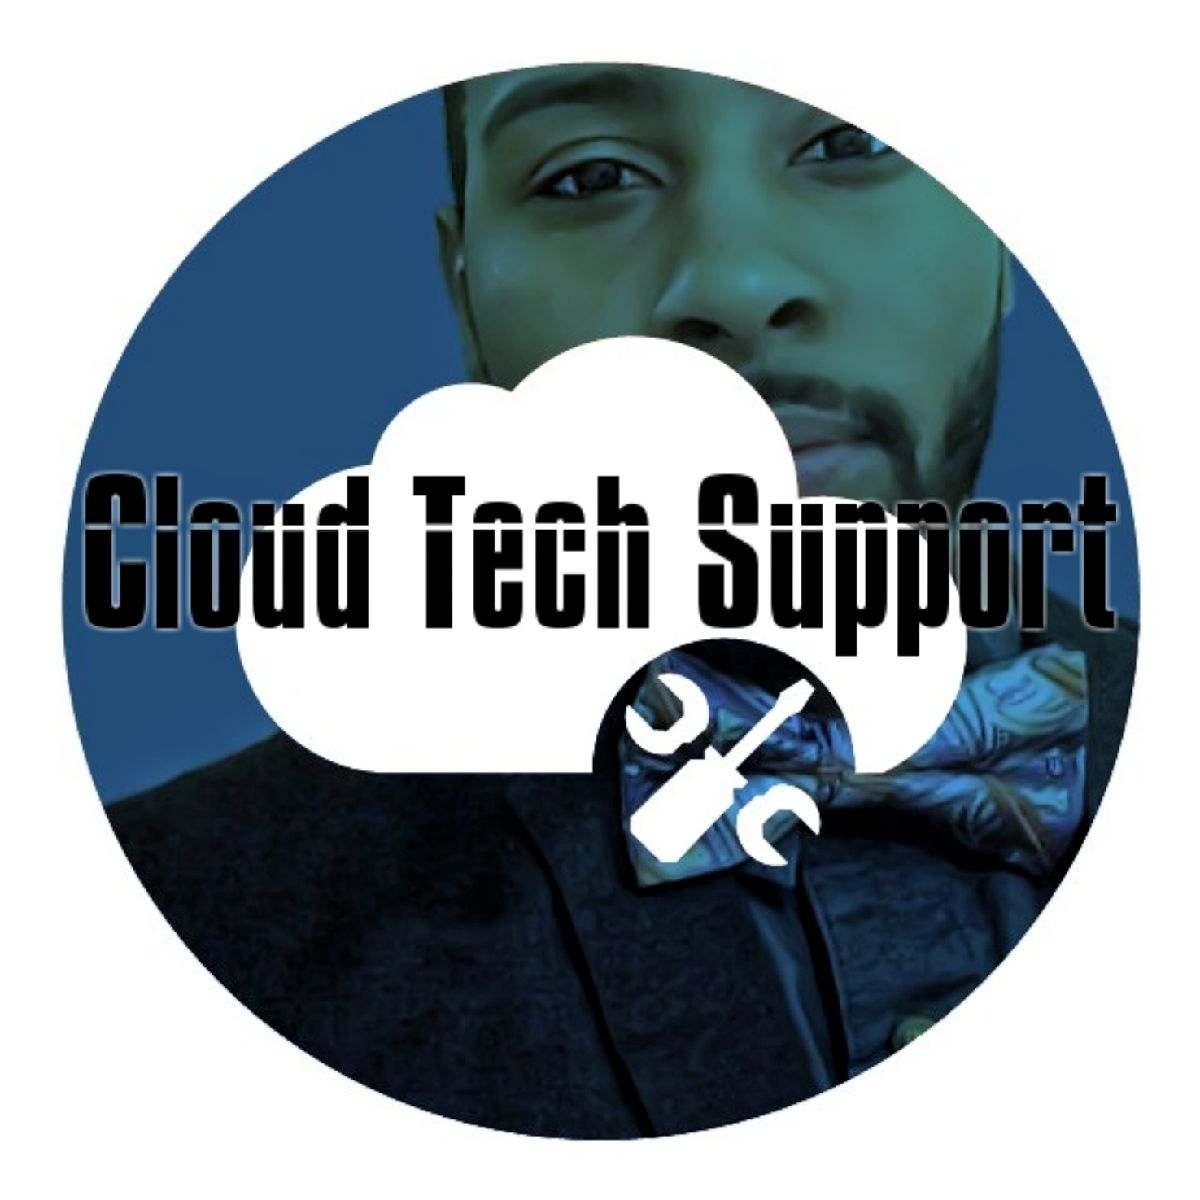 Fire Anime - CloudTech Support